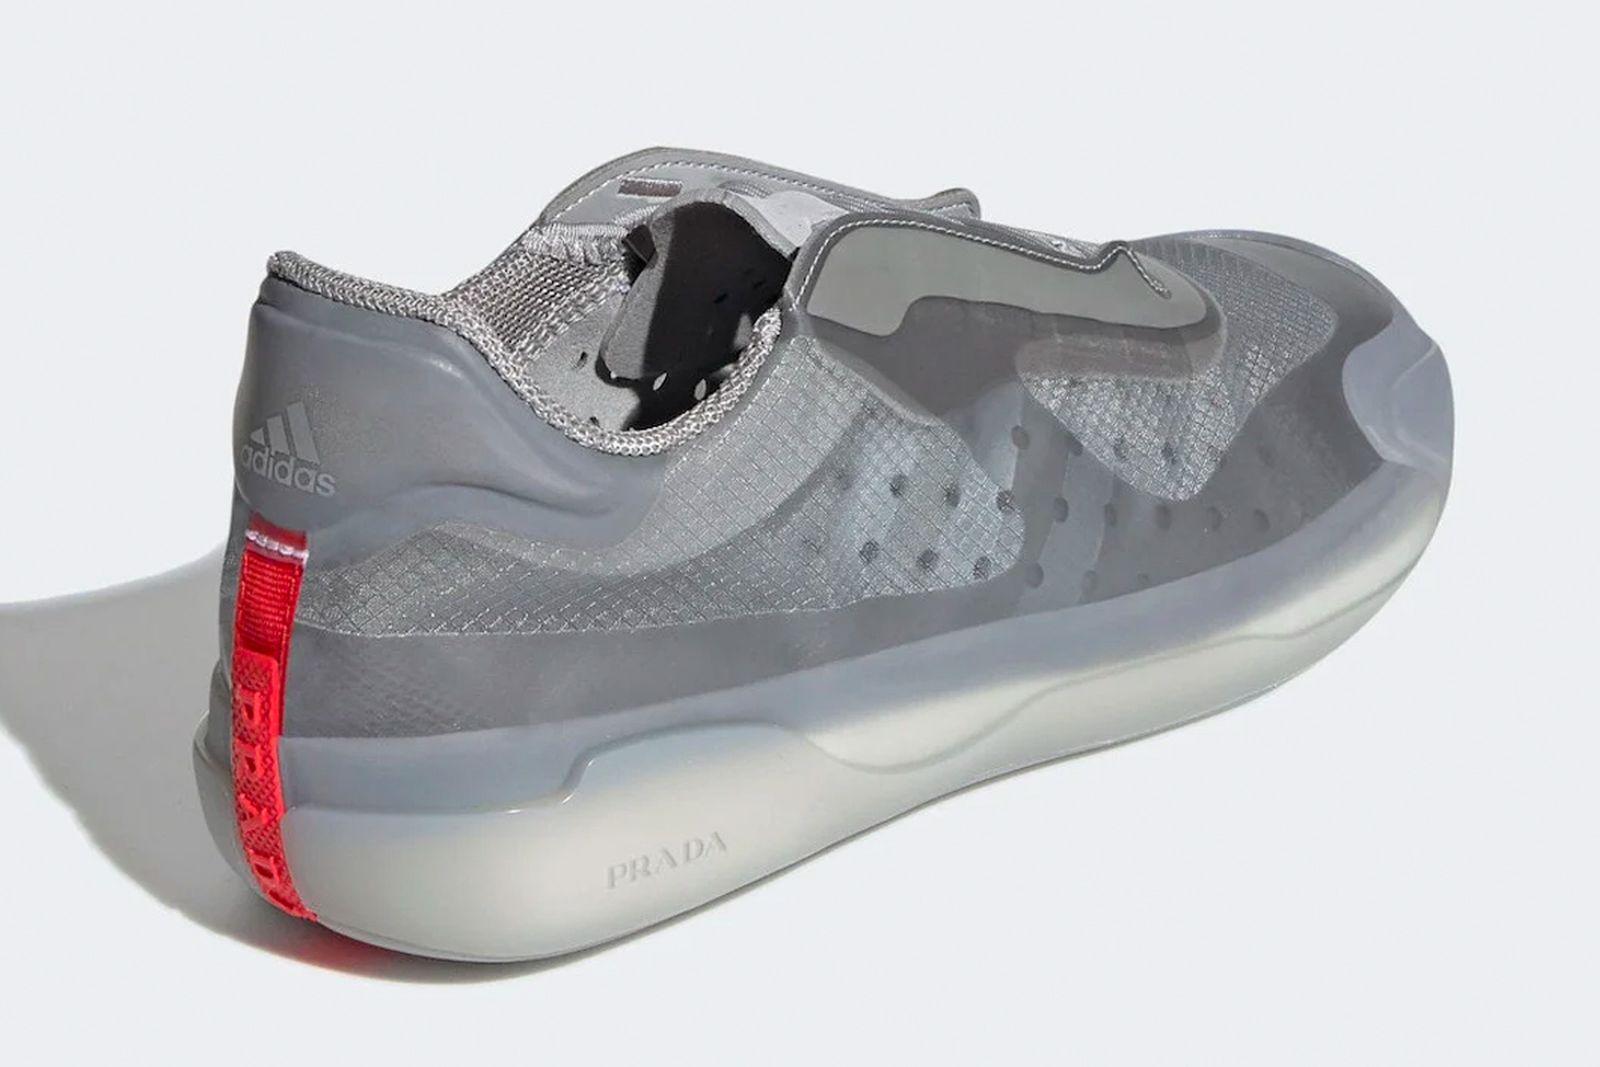 prada-adidas-luna-rossa-21-silver-release-date-price-04